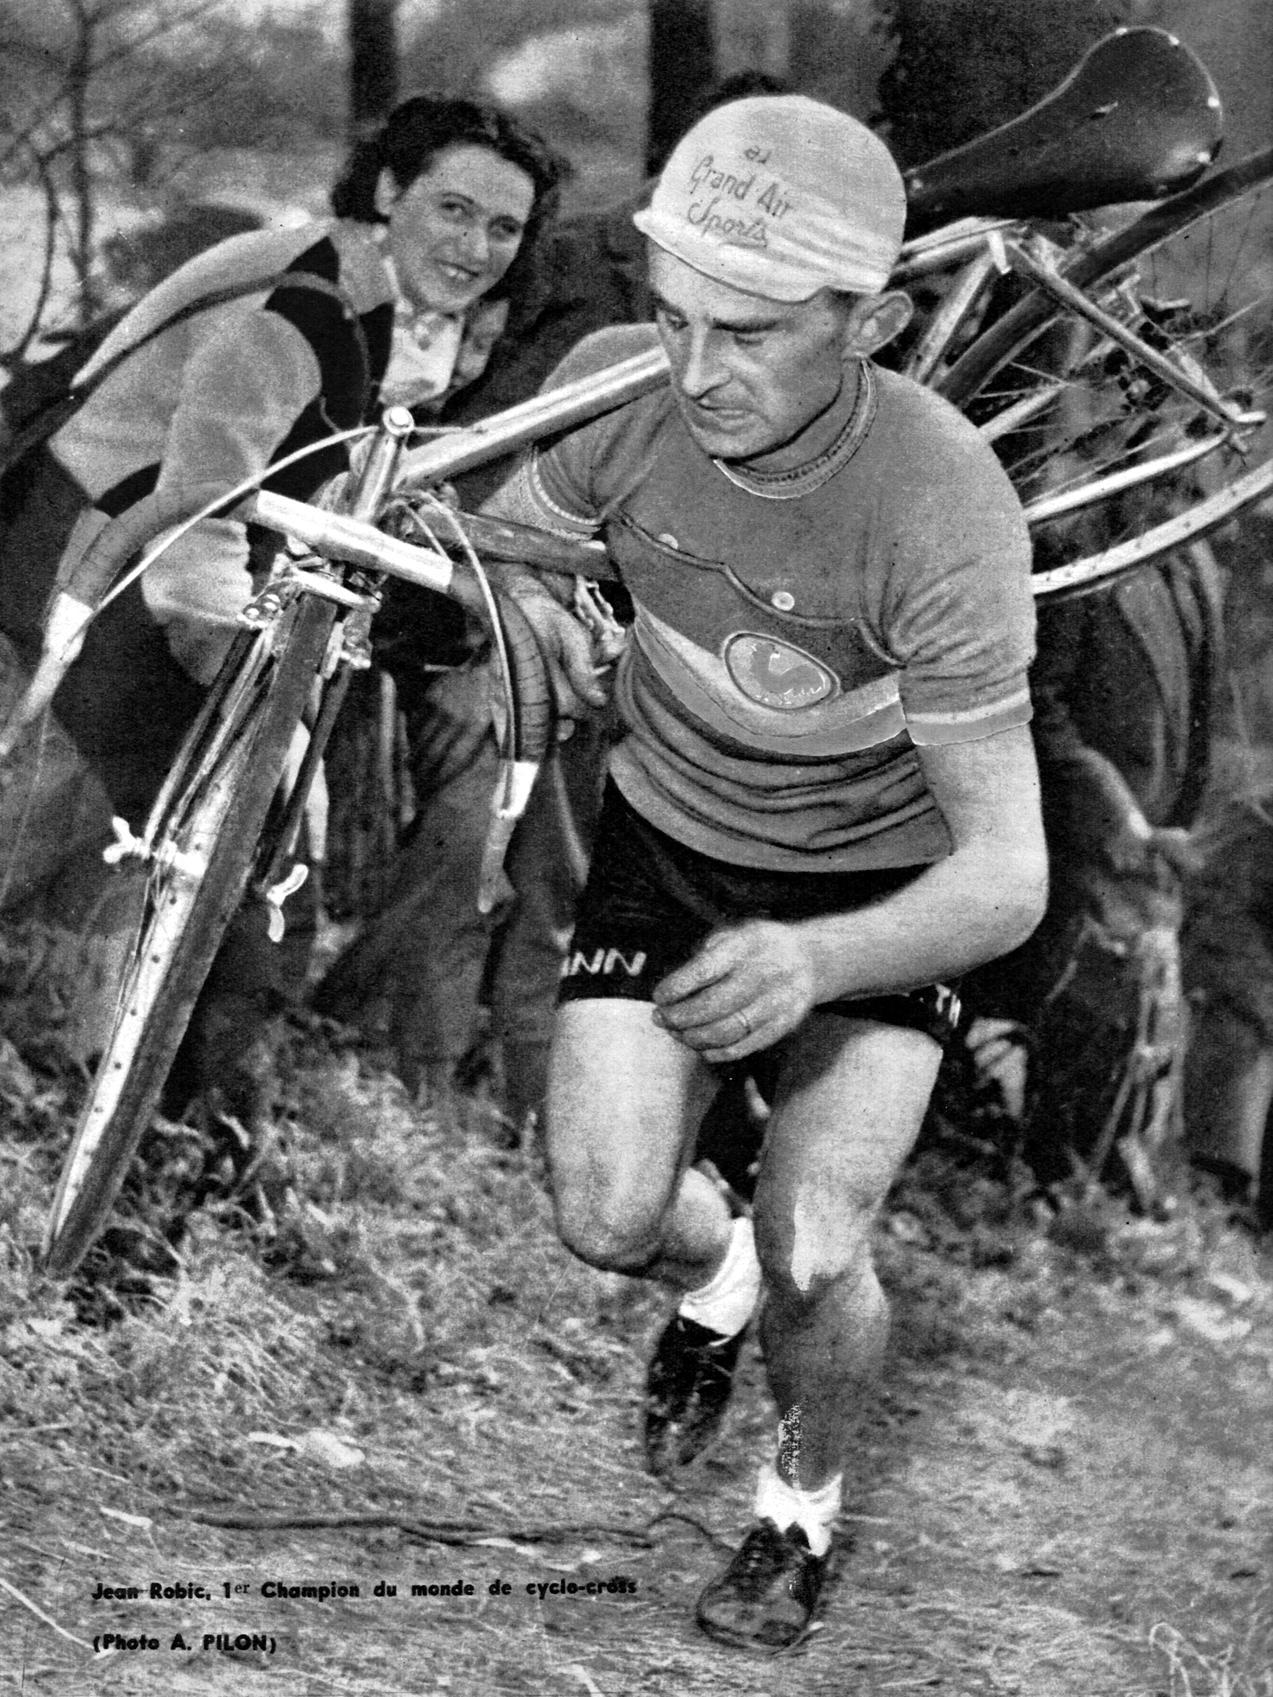 Jean Robic 1950.